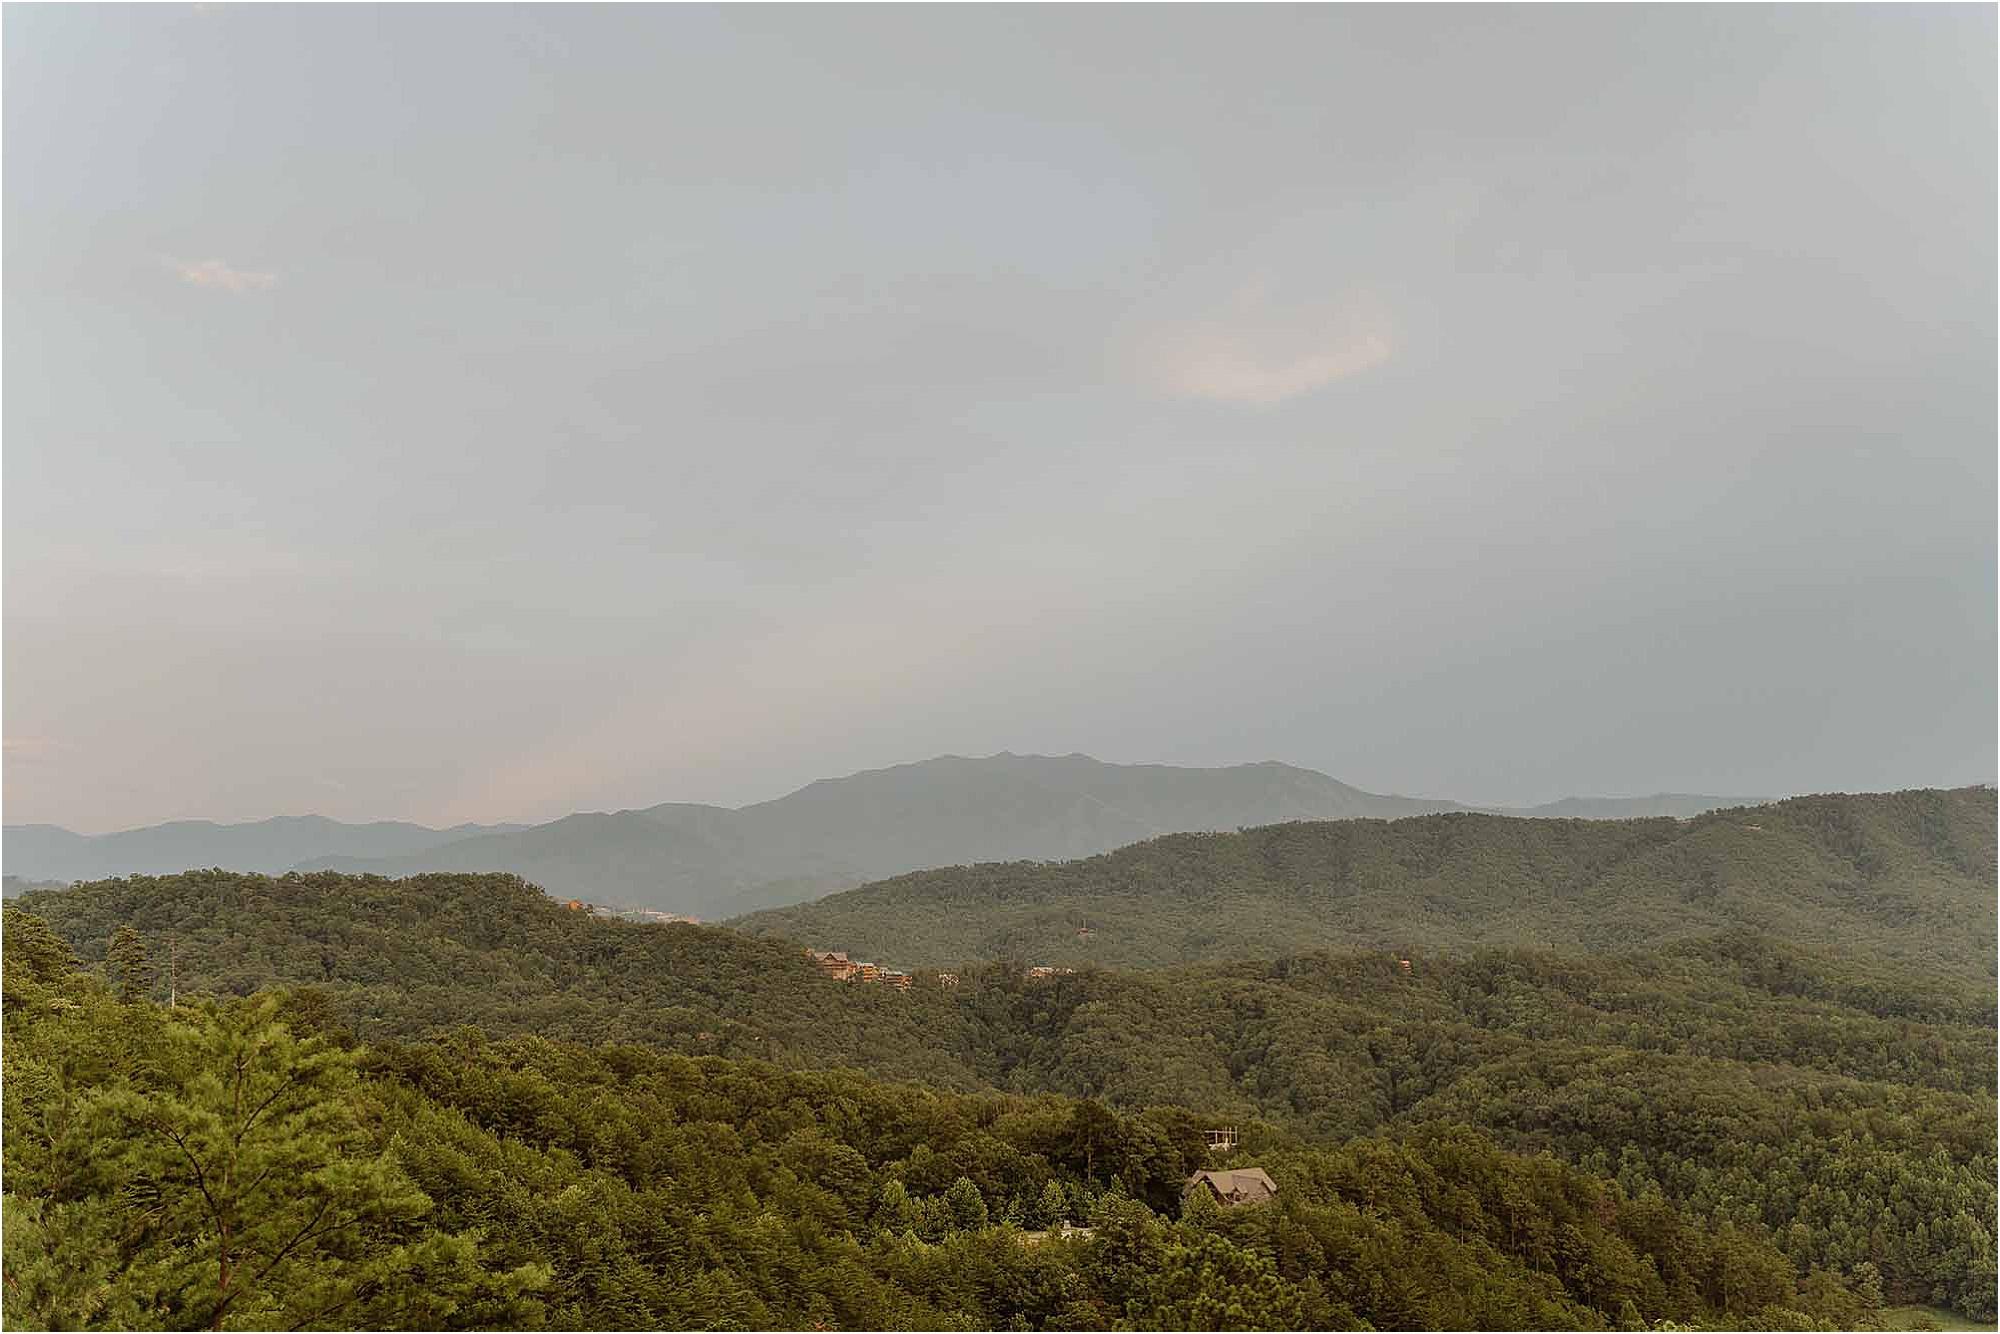 Smoky Mountain wedding venue with a view